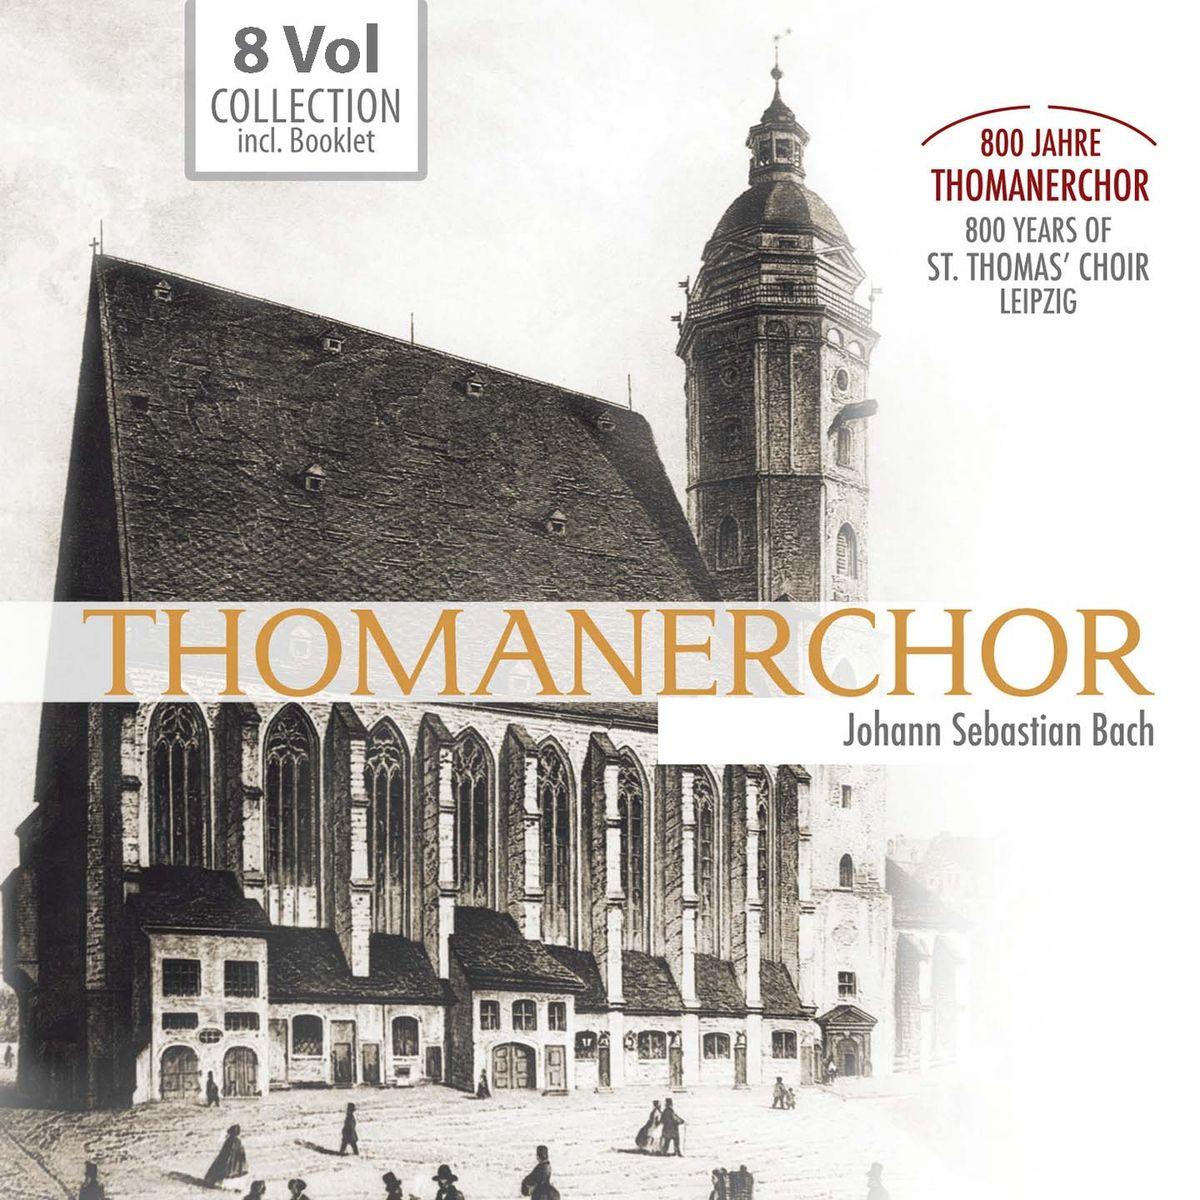 Thomanerchor. Jauchzet, Frohlocket! 800 Jahre Thomanerchor, Leipzig / Rejoice and be glad – 800 years of St. Thomas' choir, Leipzig (8 CD)